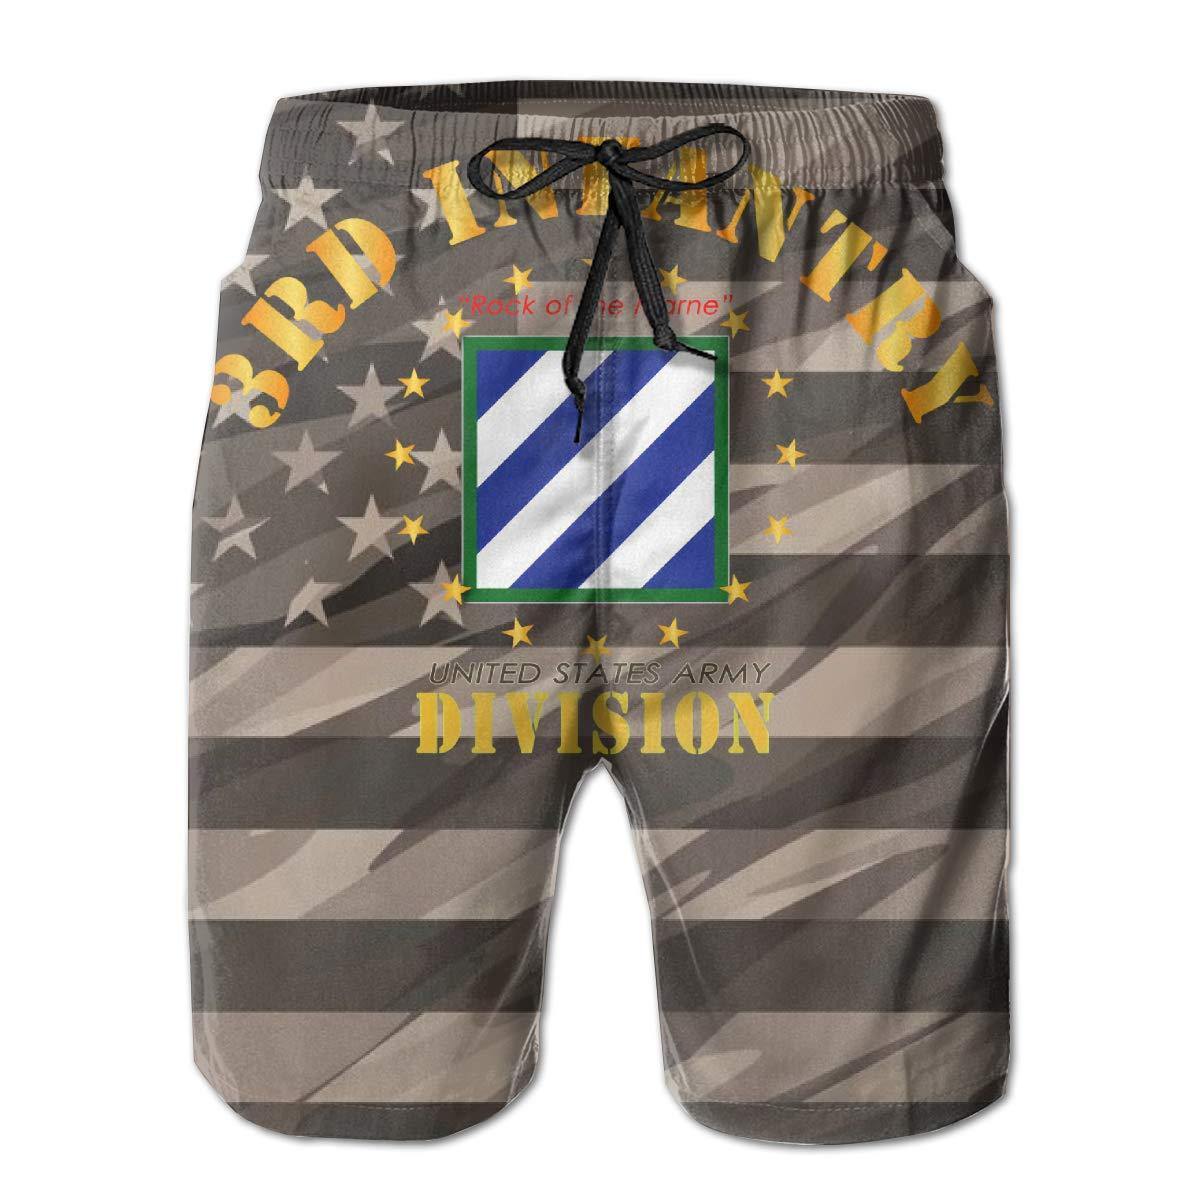 Third Infantry Division Logo Mens Swim Trunks Bathing Suit Beach Shorts